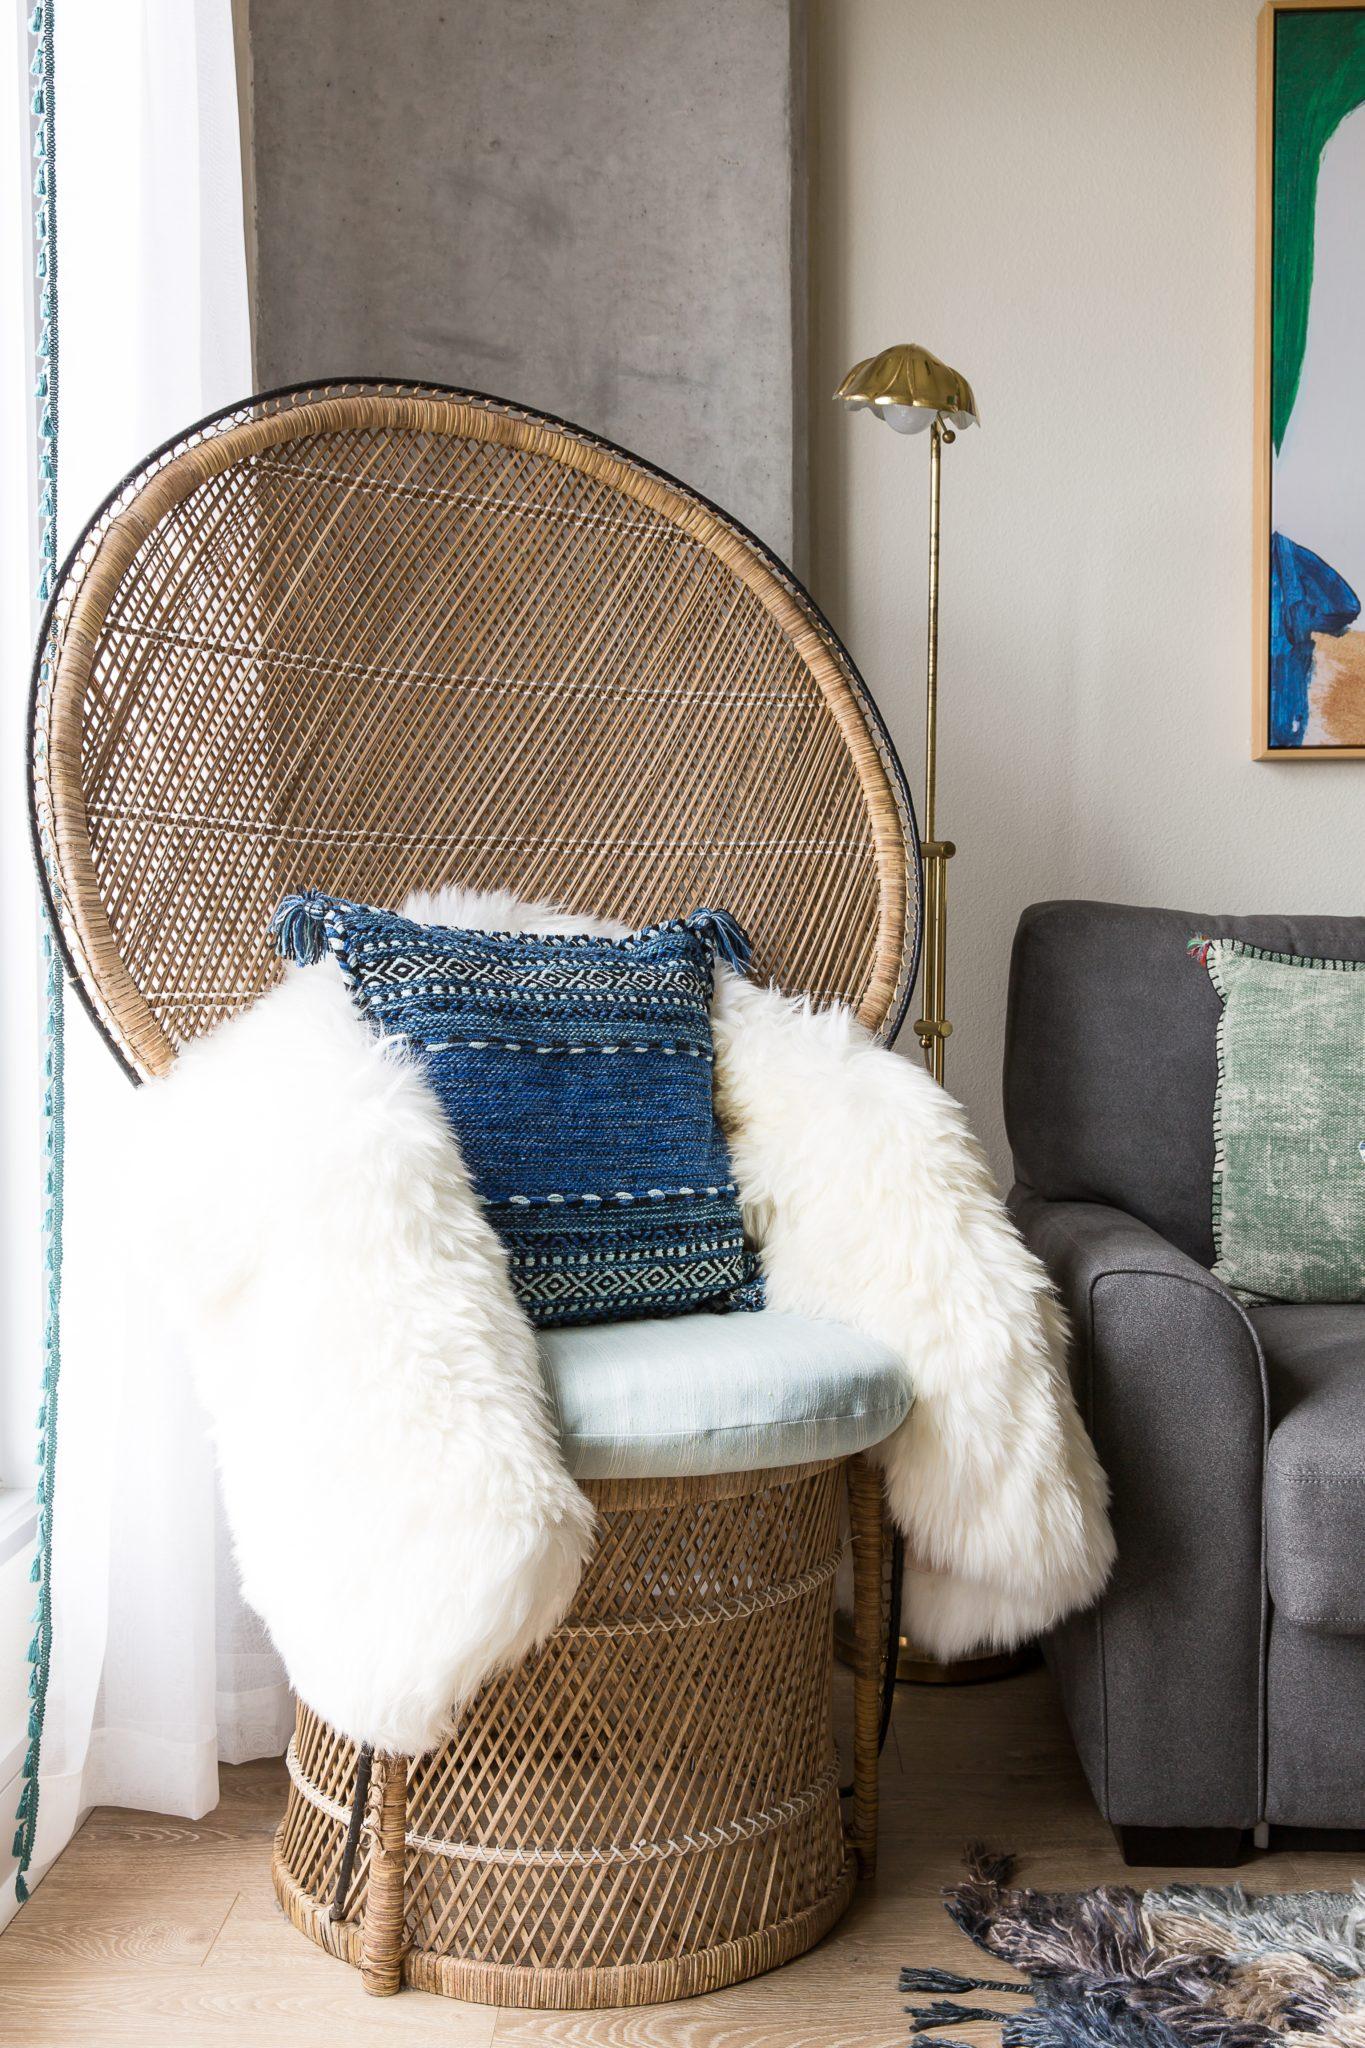 Woven Peacock Chair + Fur Throw + Navy Pom-Pom Pillow by Maureen Stevens Design